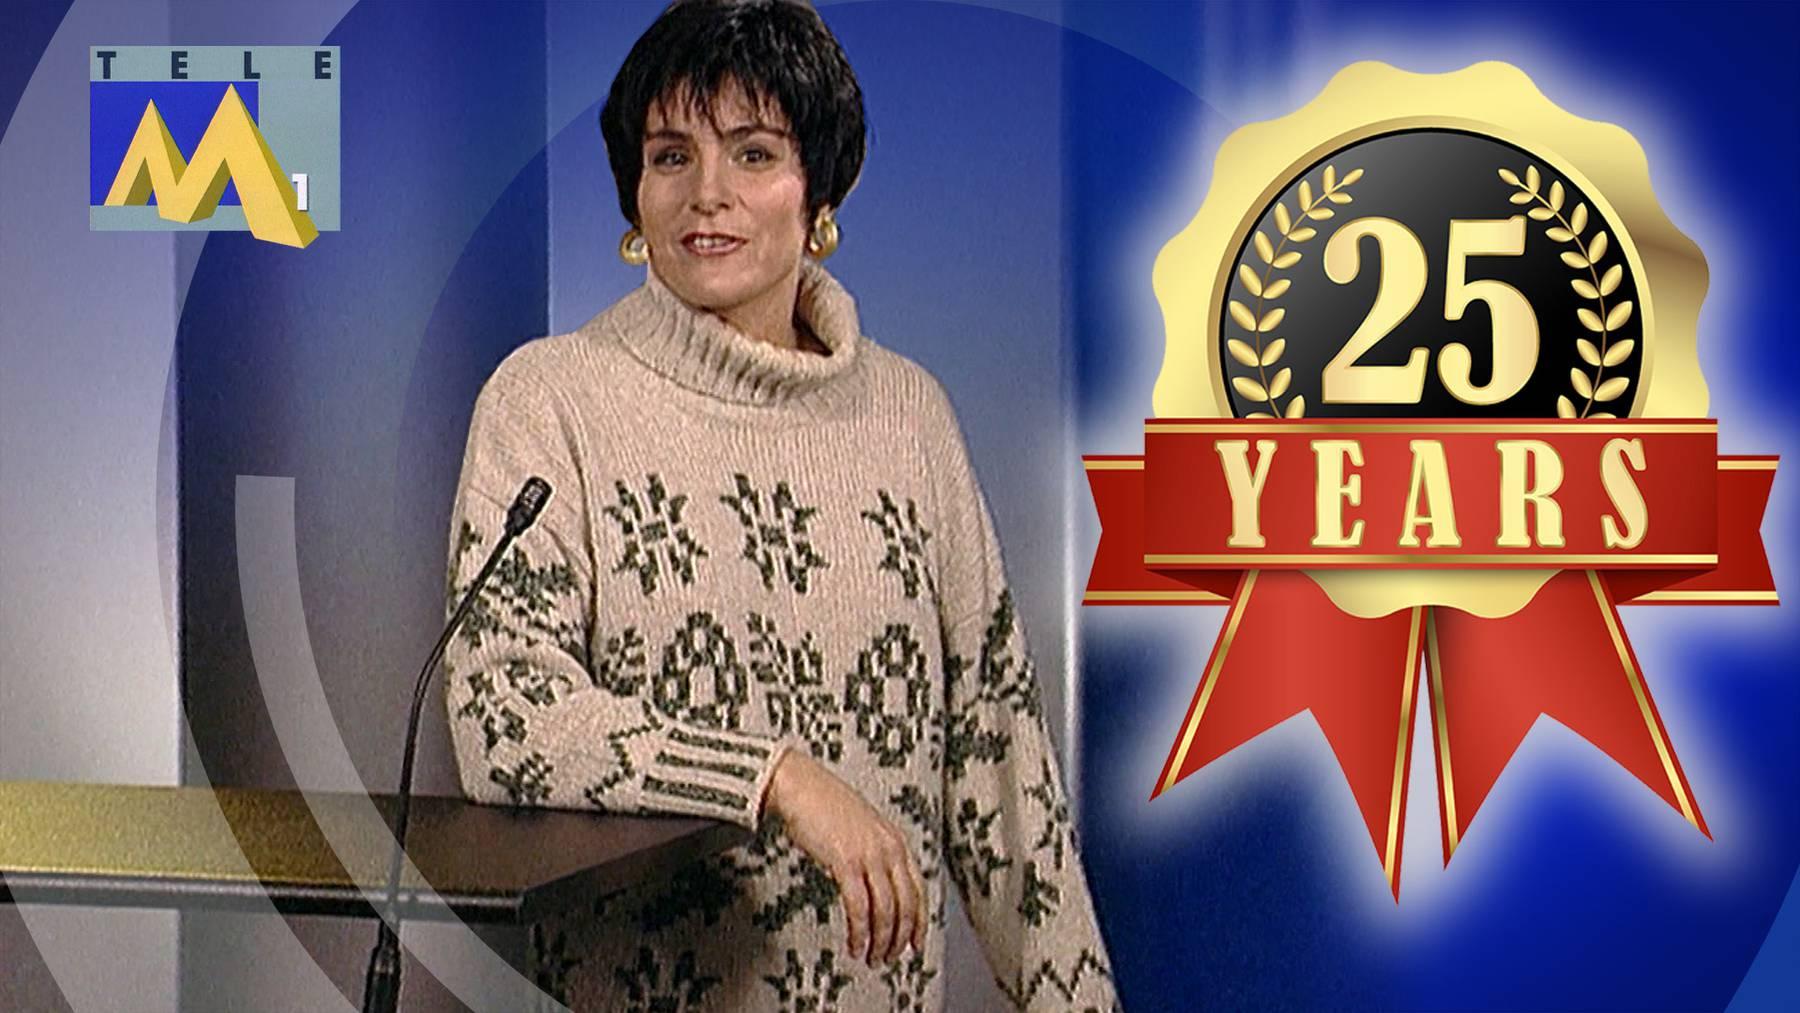 25 Jahre Tele M1